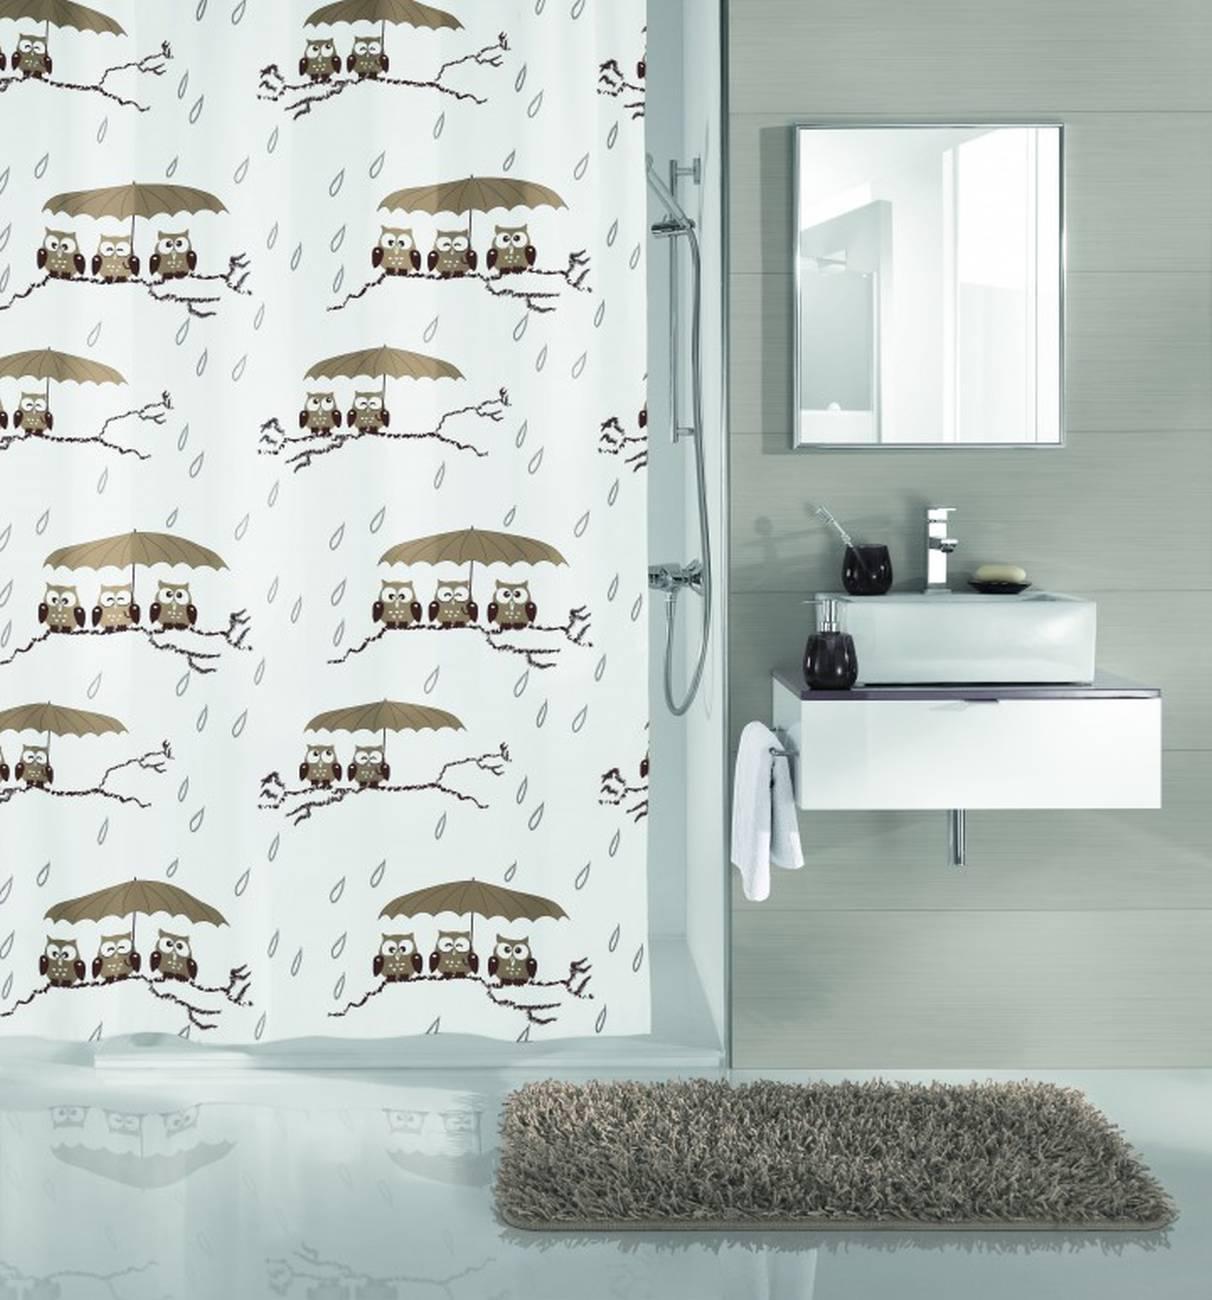 Duschvorhang Eulen 100 % Polyester Taupe 180x180 cm